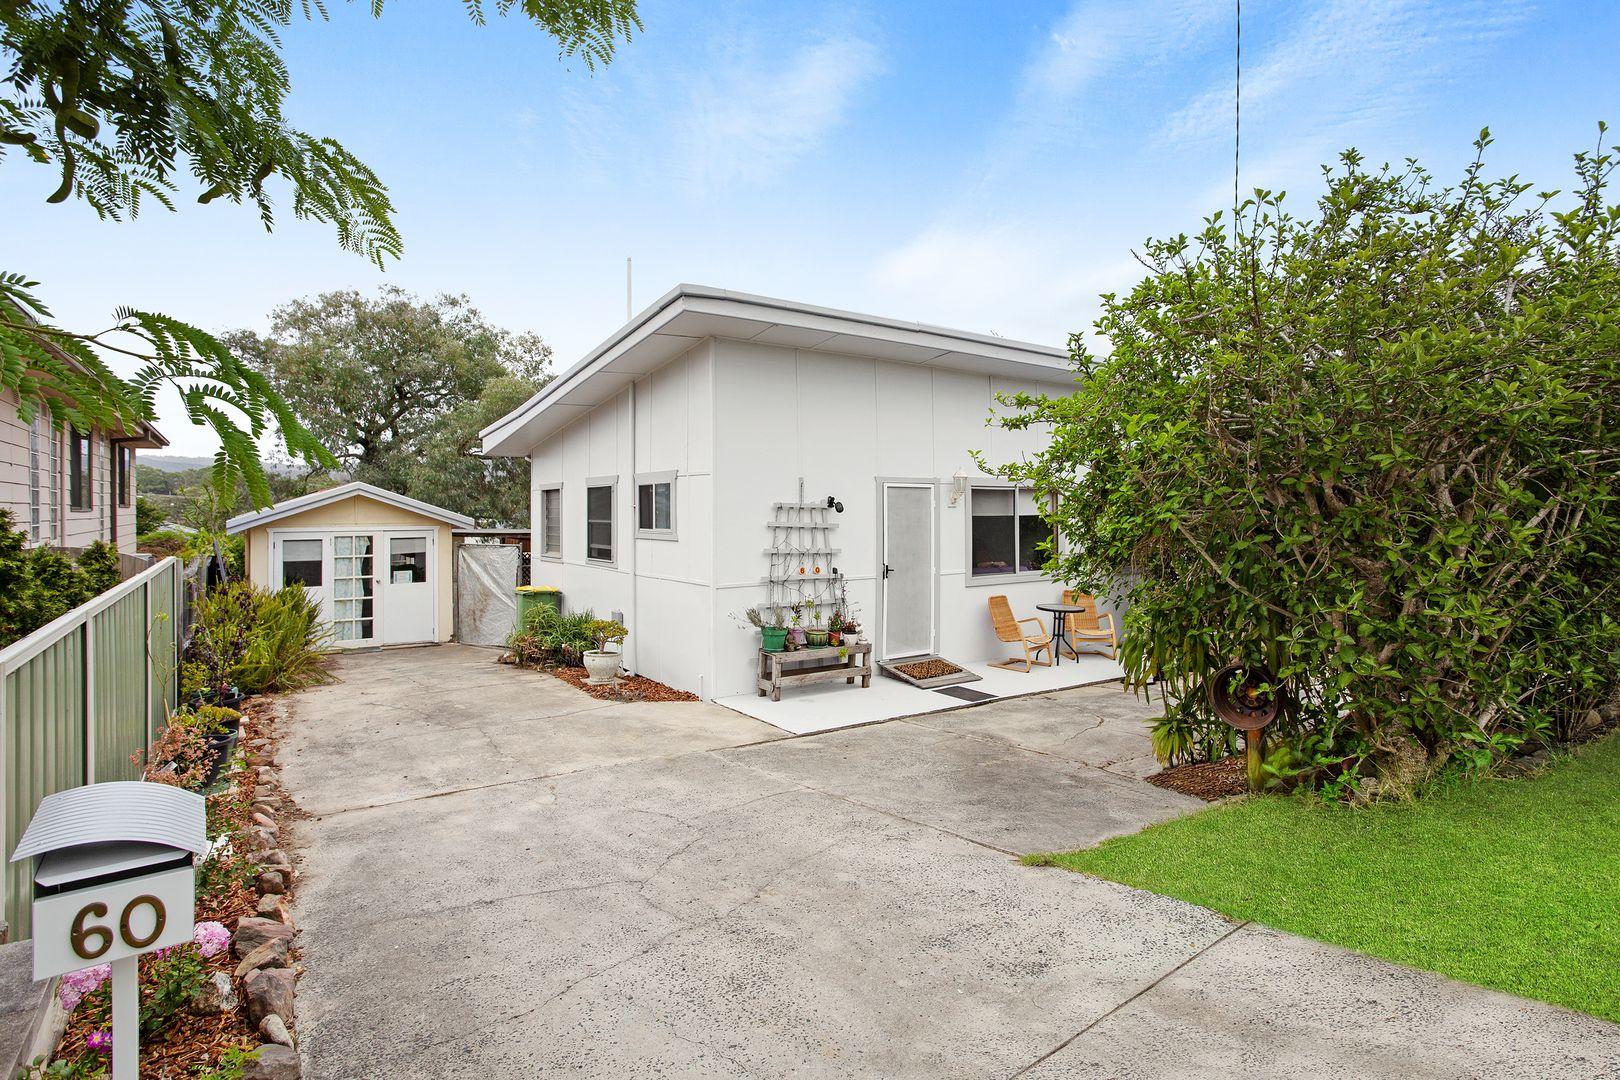 60 George Evans Road, Killarney Vale NSW 2261, Image 1